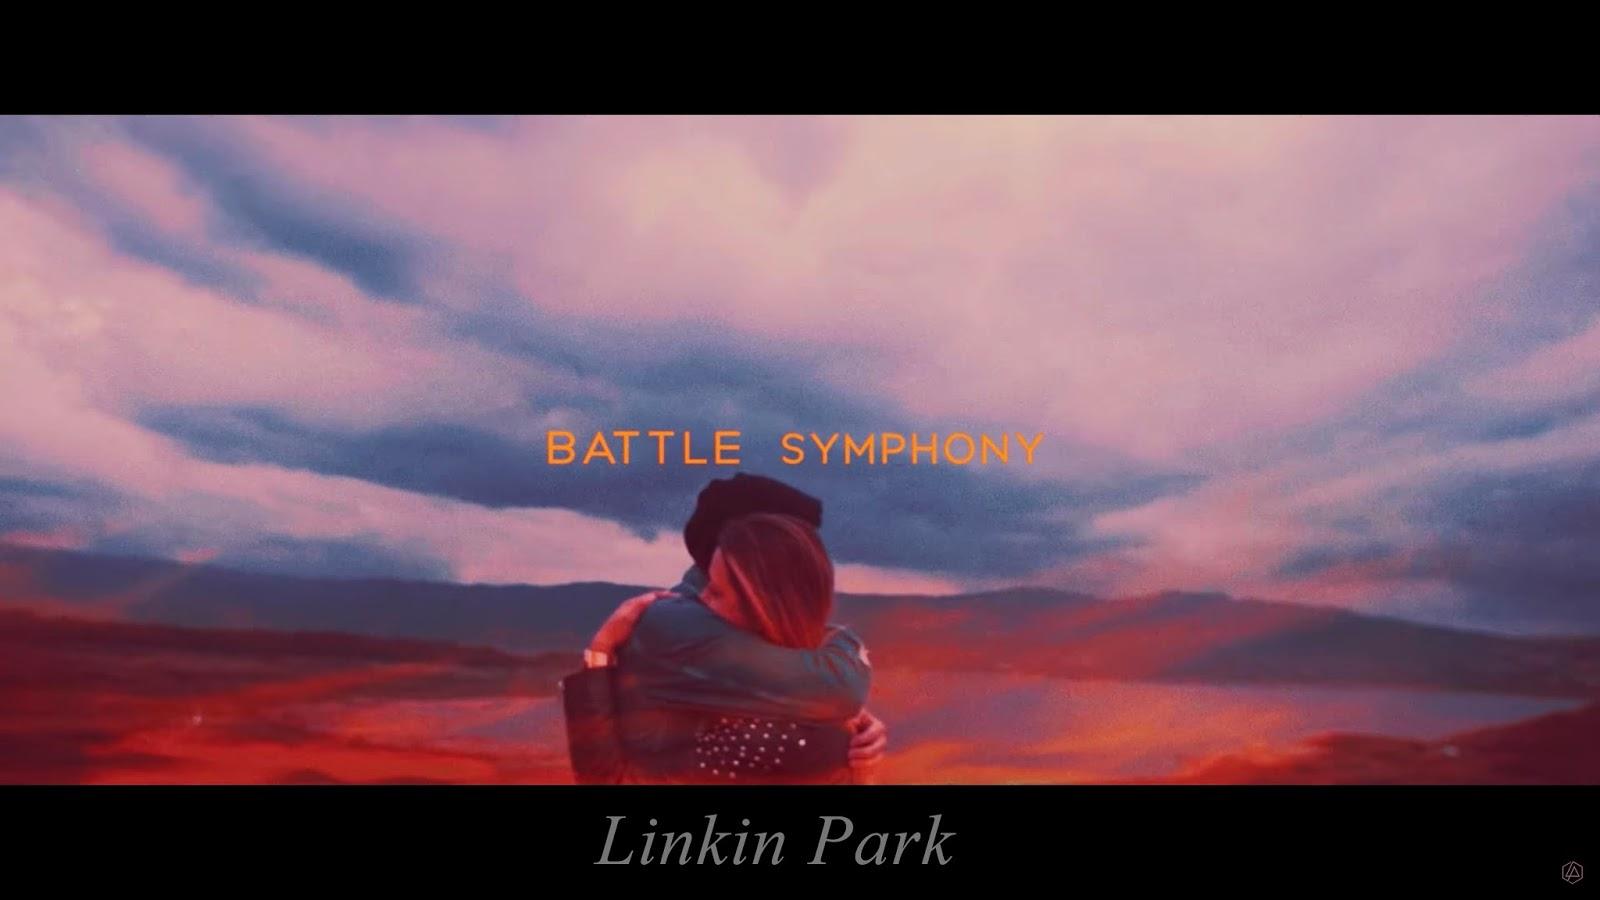 Guitar Chords Linkin Park Battle Symphony Lyrics And Guitar Chords